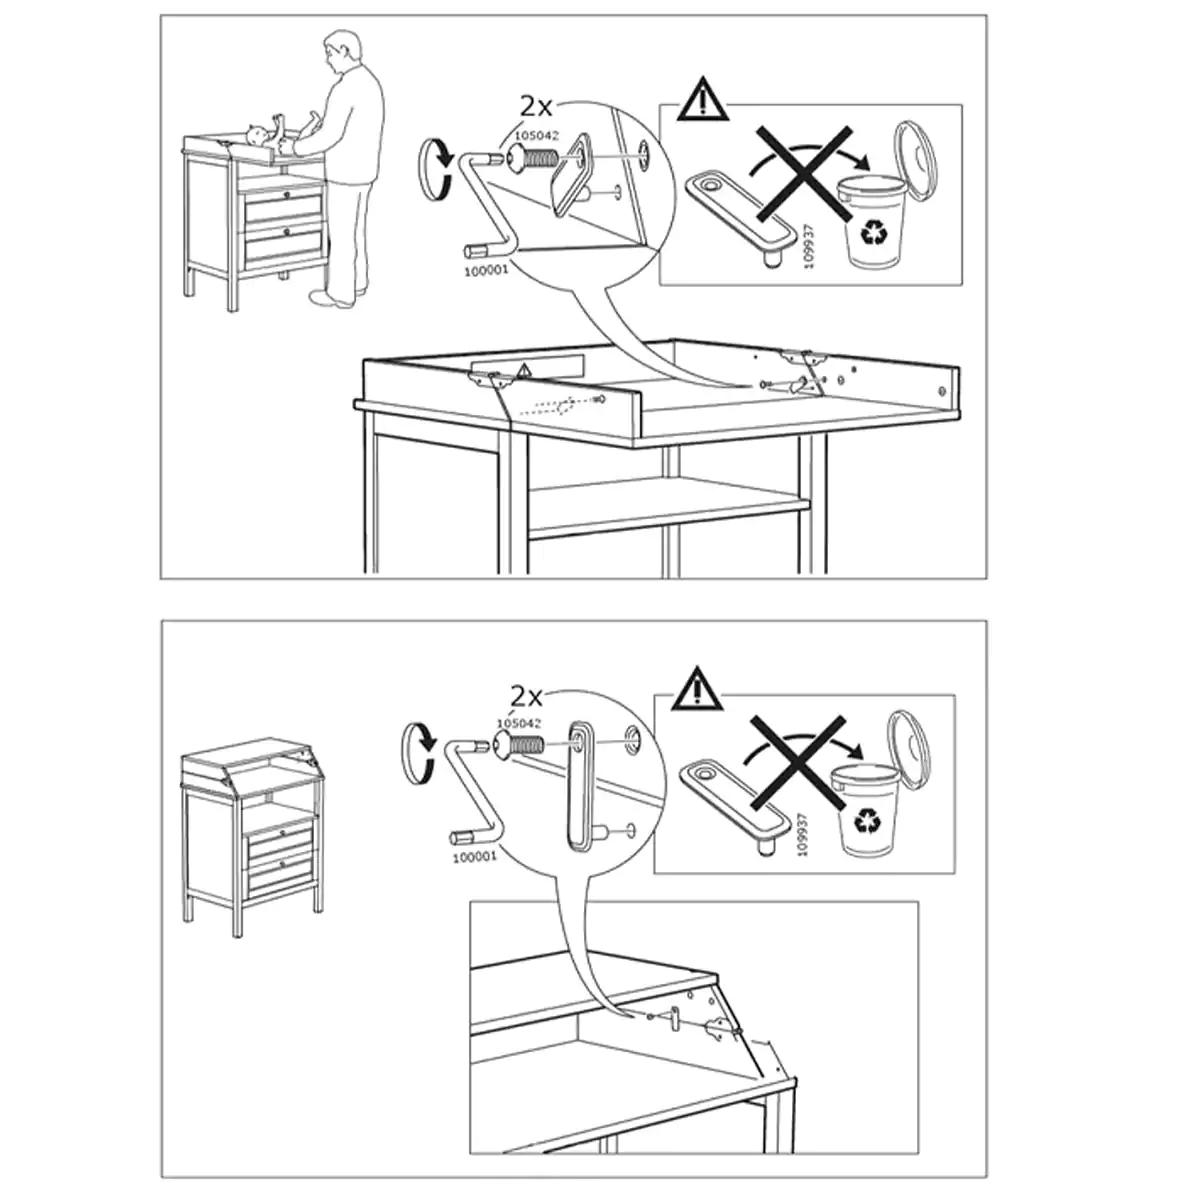 Cassettiera Fasciatoio Sundvik Ikea Mette In Guardia Bloccate La